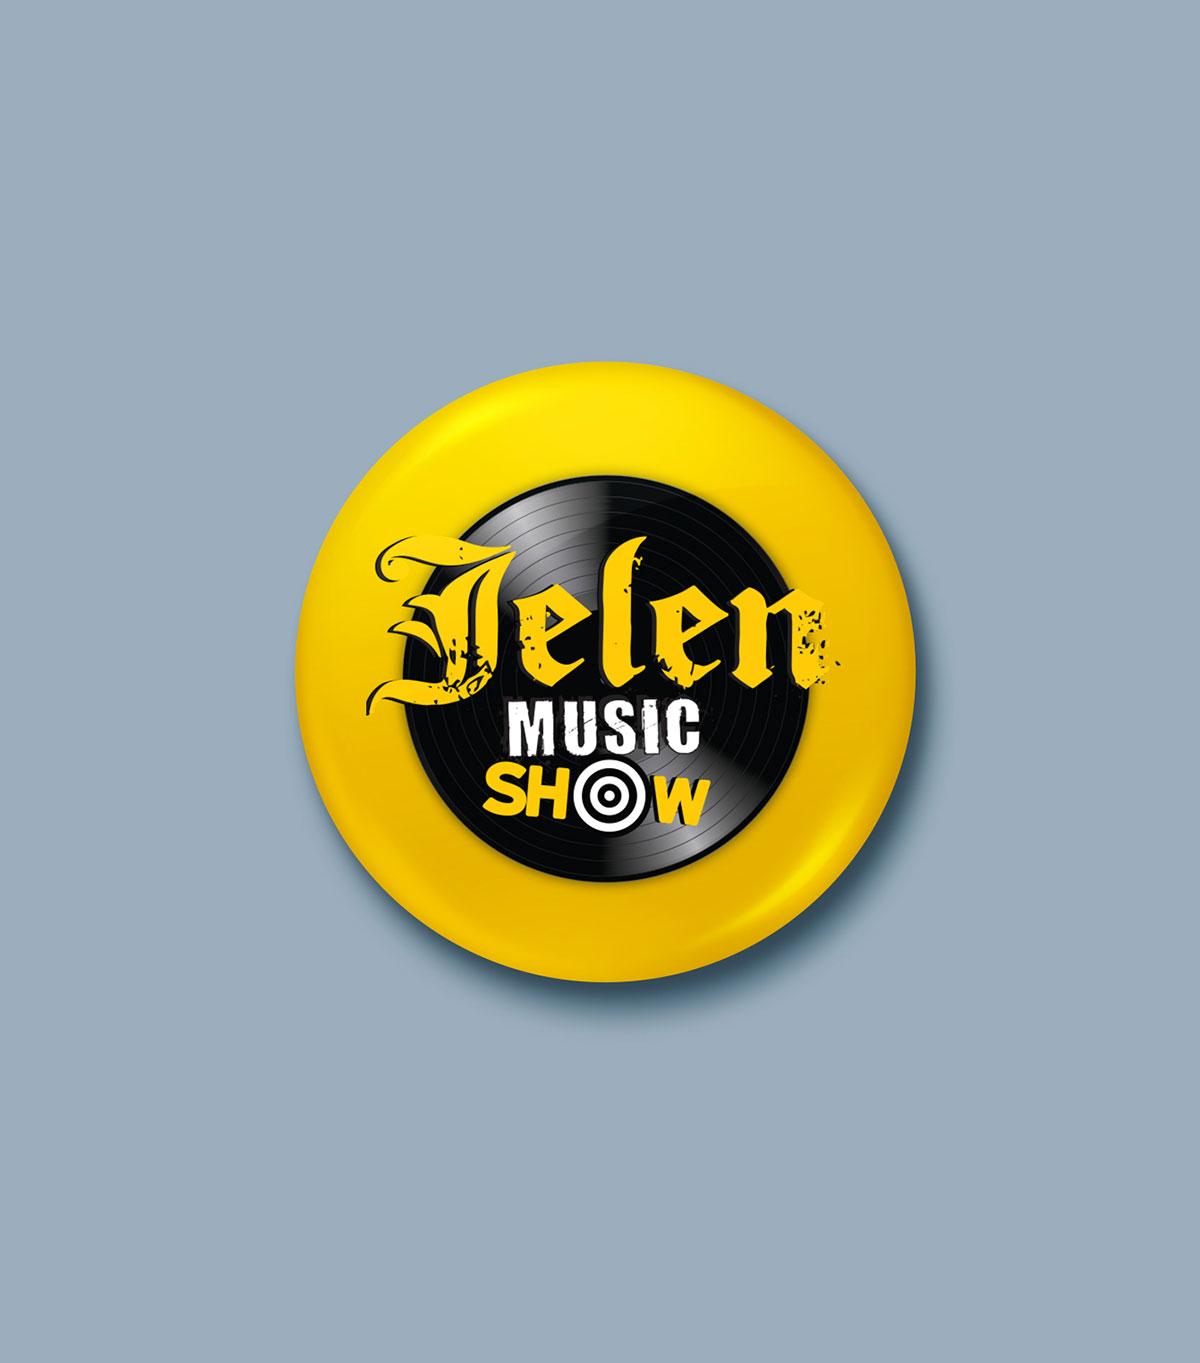 Jelen_Music_Show_Live-Design_11